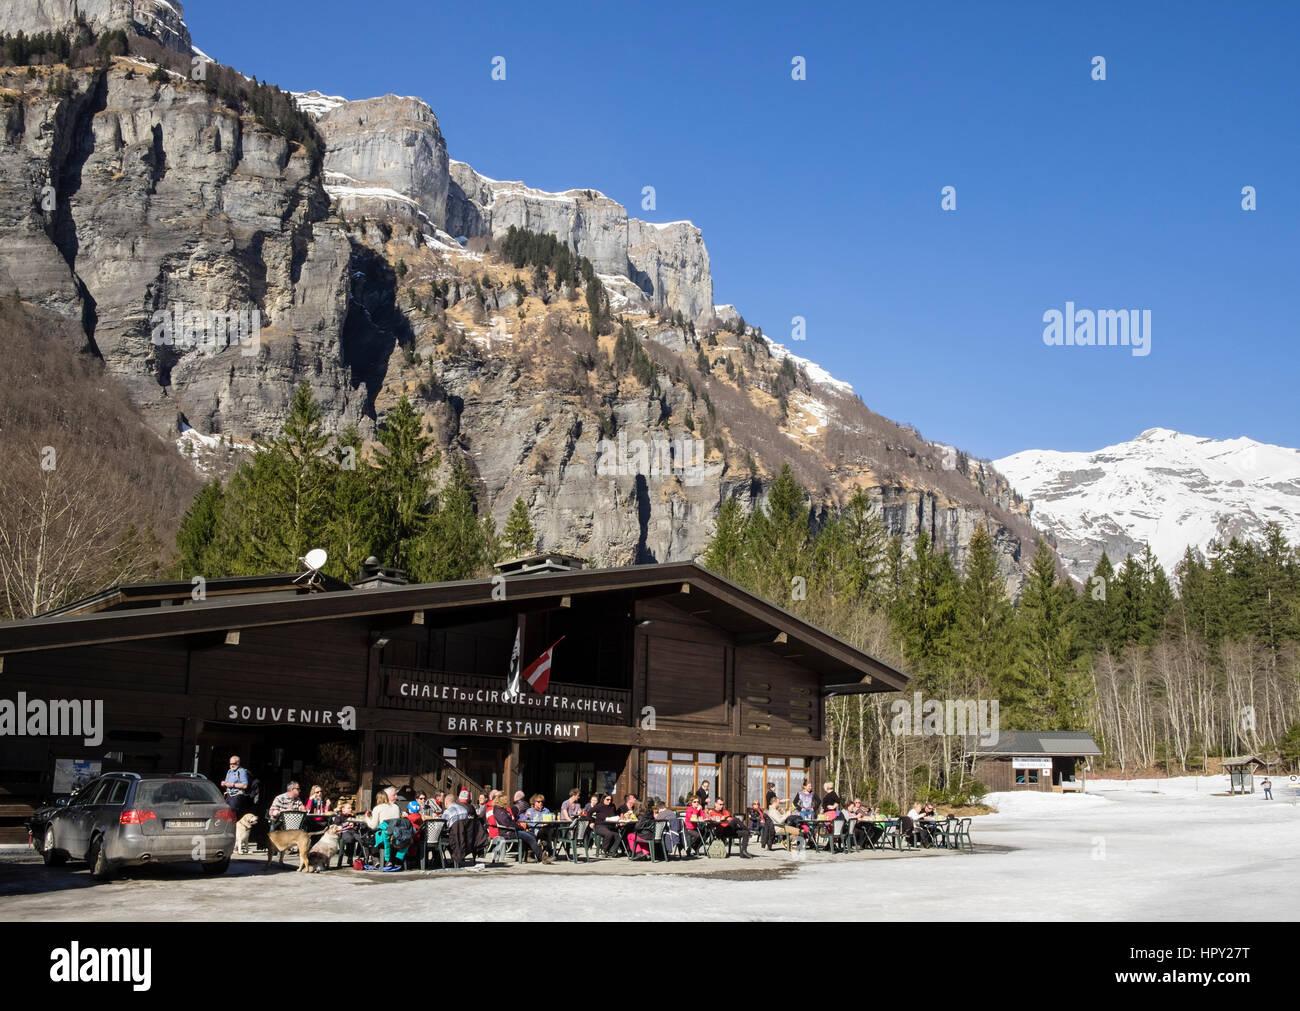 Chalet du Cirque du Fer A Cheval bar restaurant in Reserve Naturelle de Sixt Fer A Cheval in French Alps. Samoens, - Stock Image